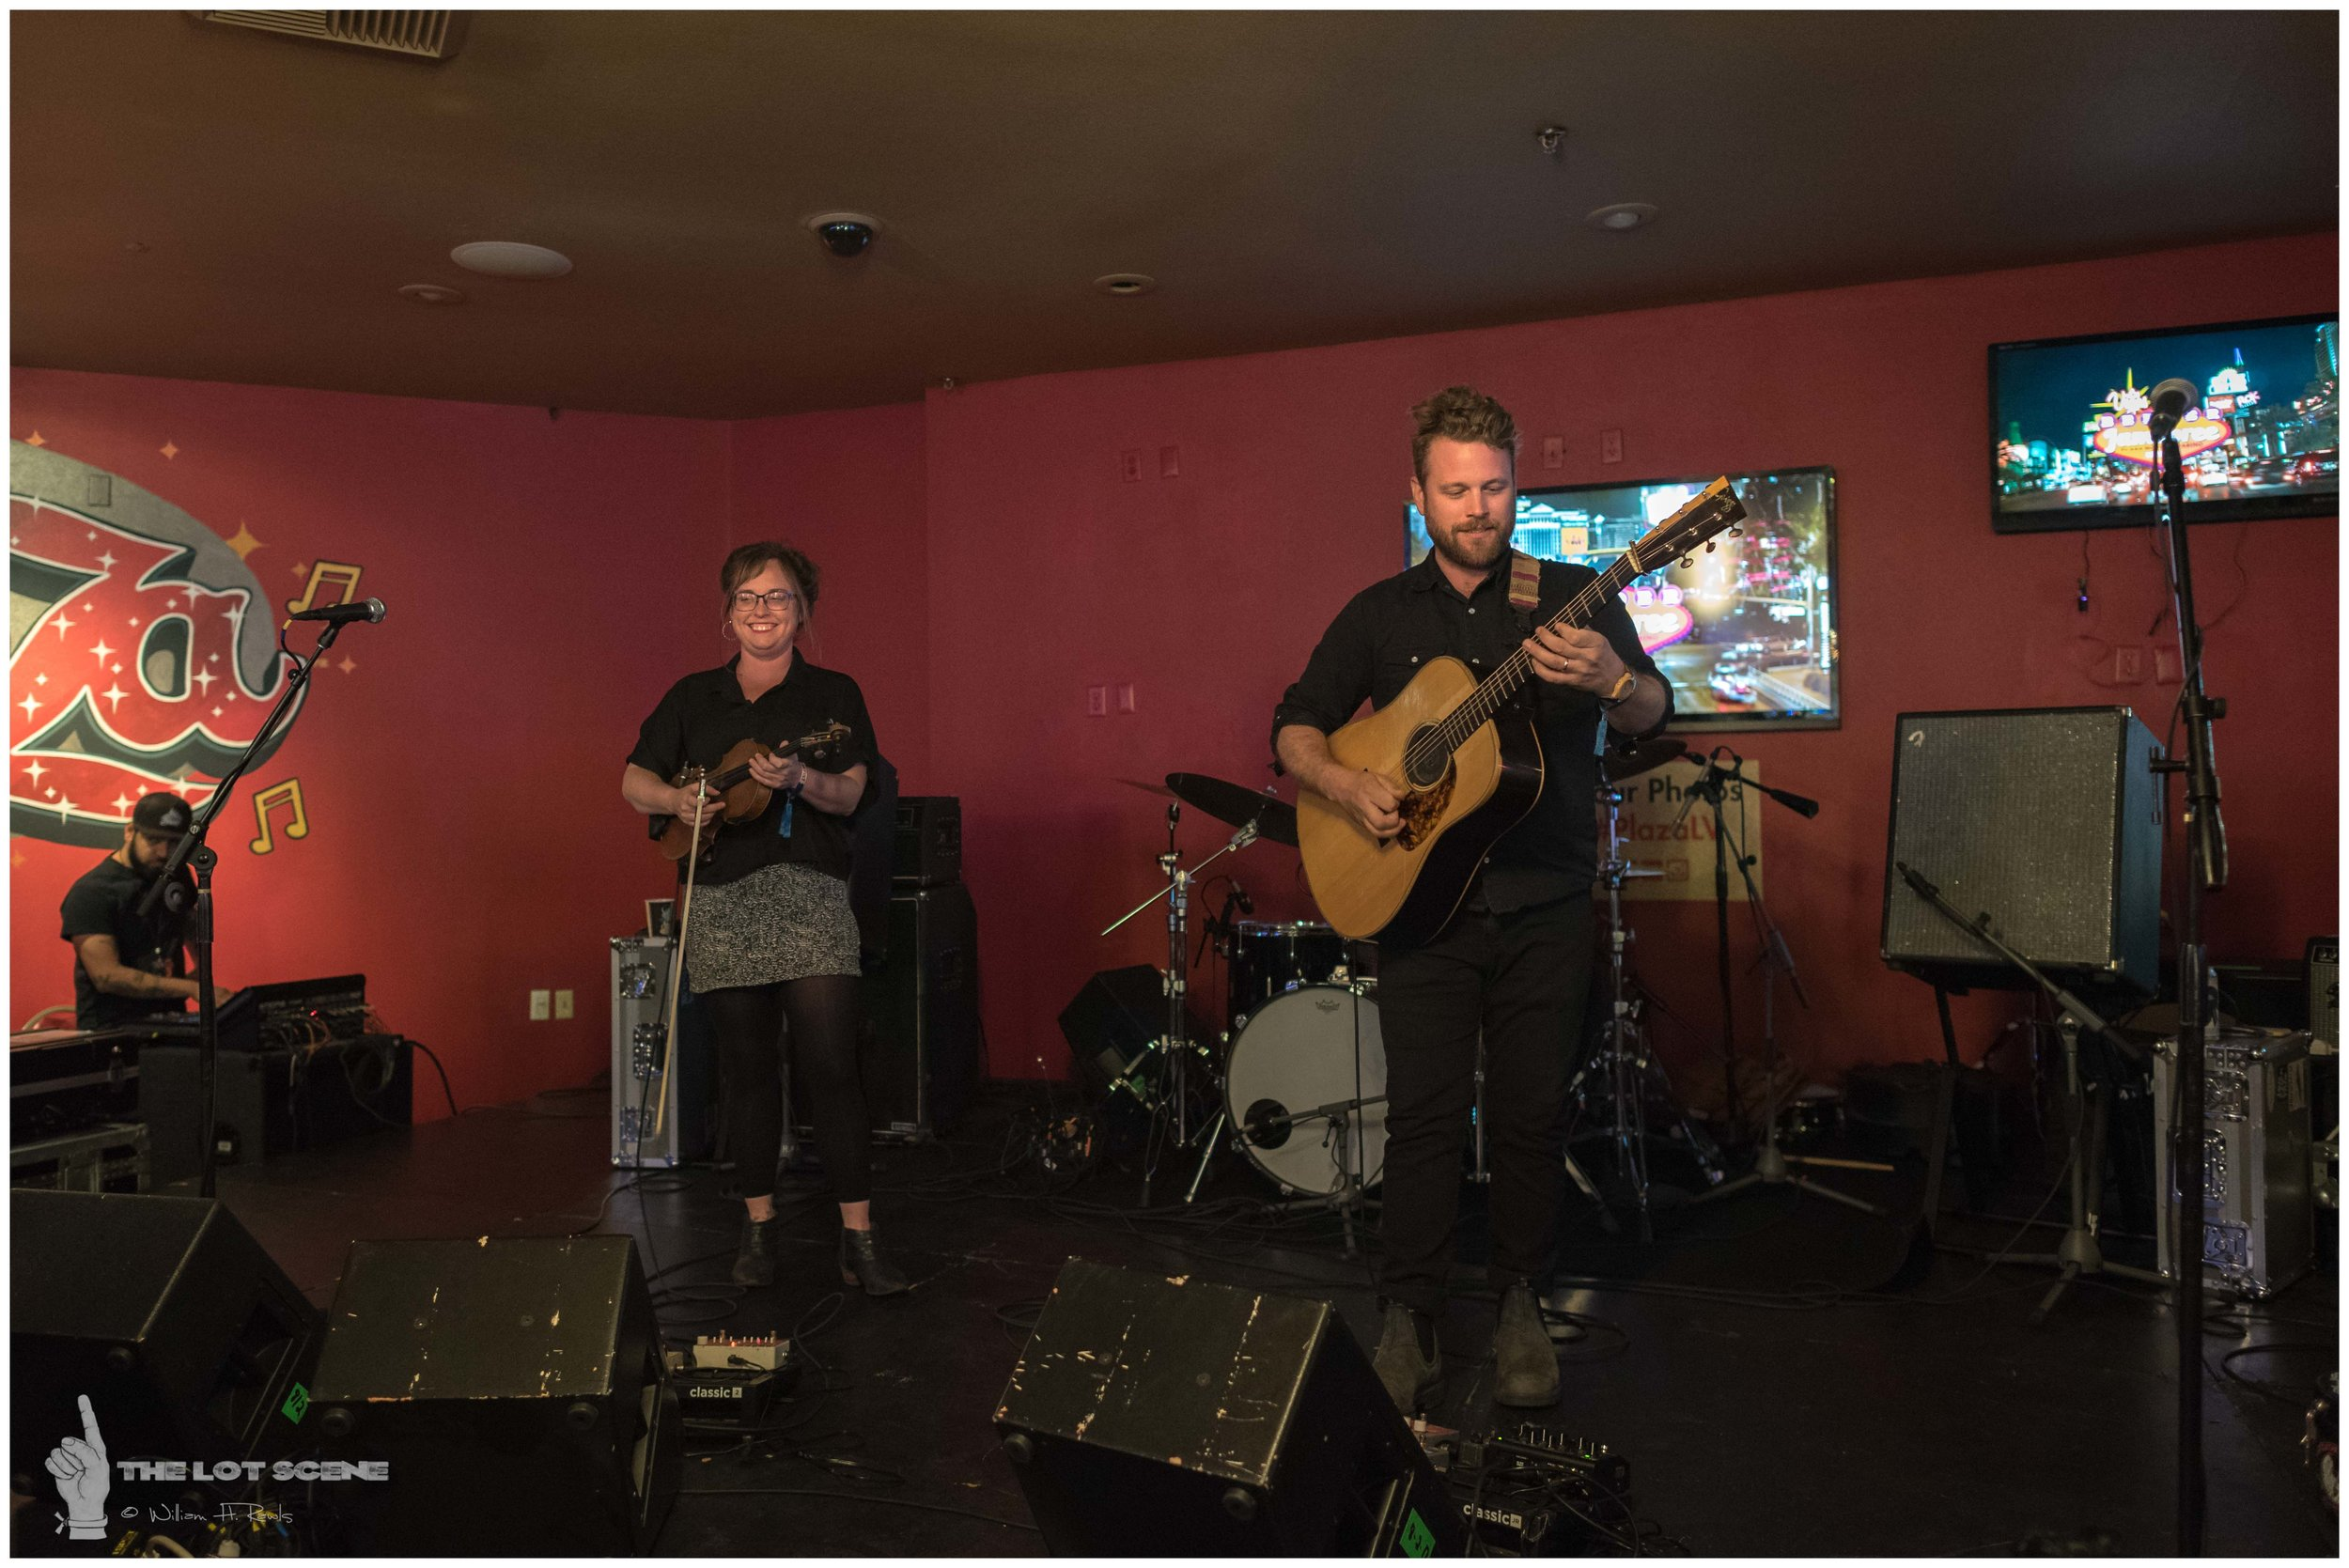 Bender Jamboree 2018 - John Stickley Trio - 1.jpg